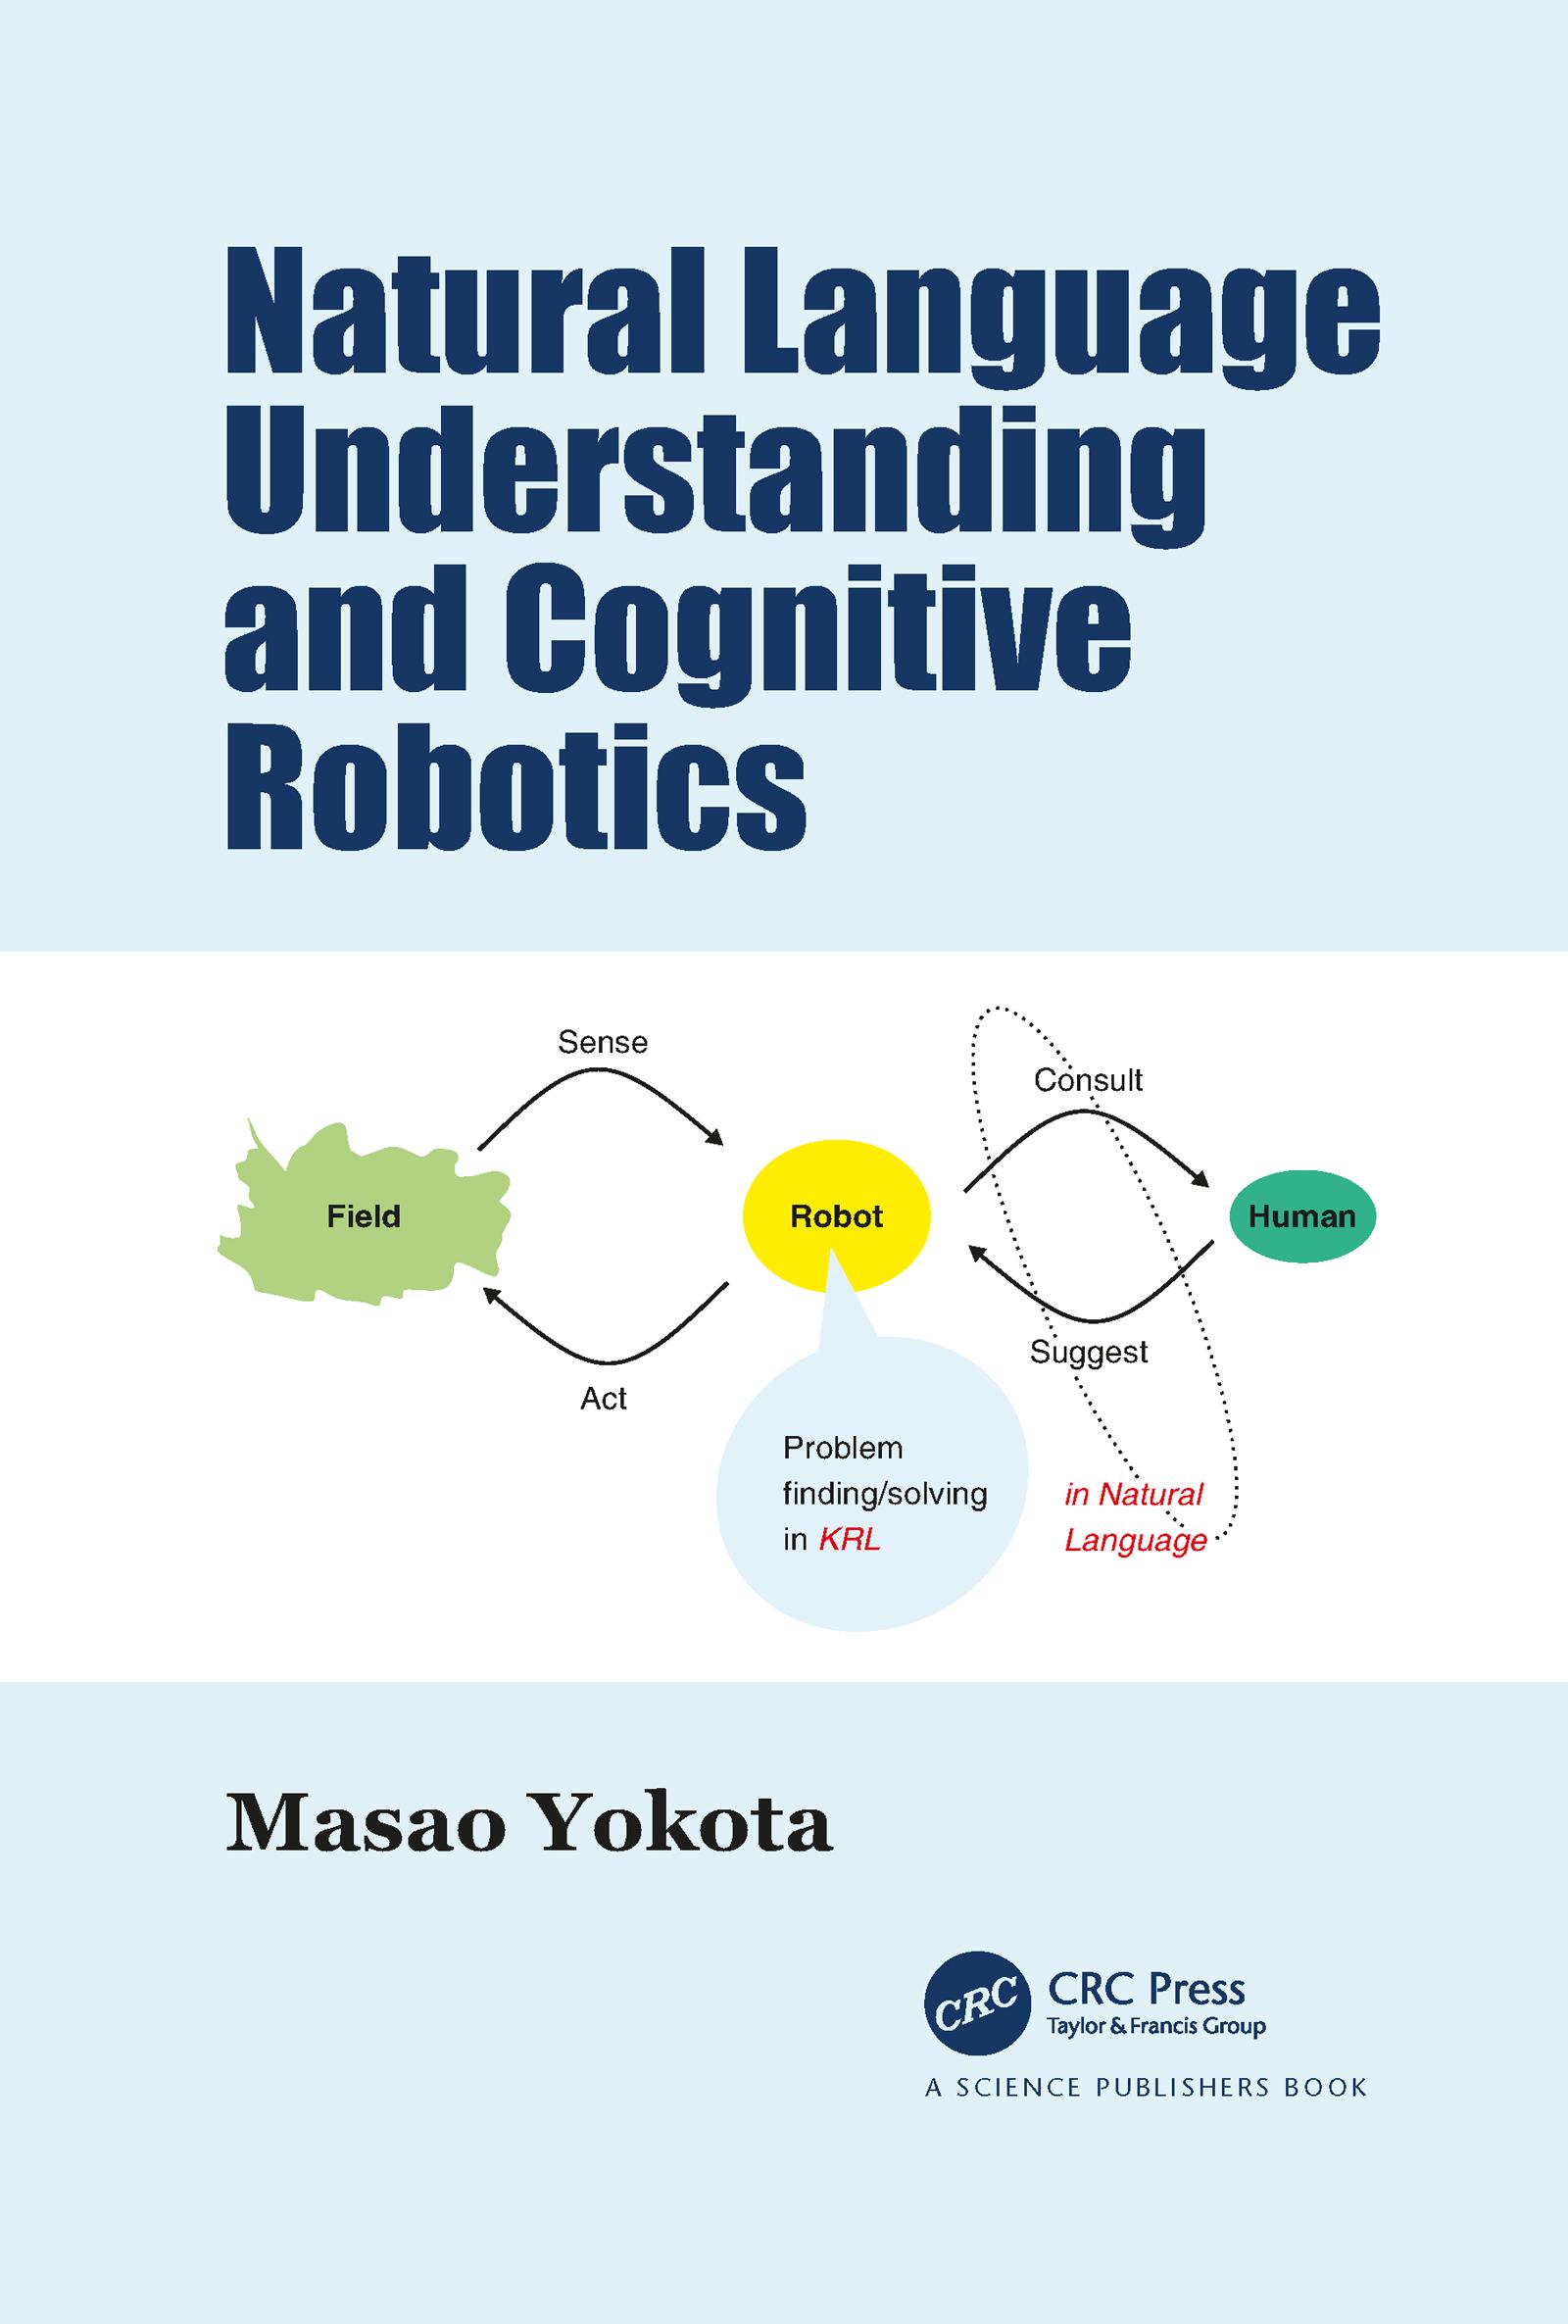 Natural Language Understanding and Cognitive Robotics